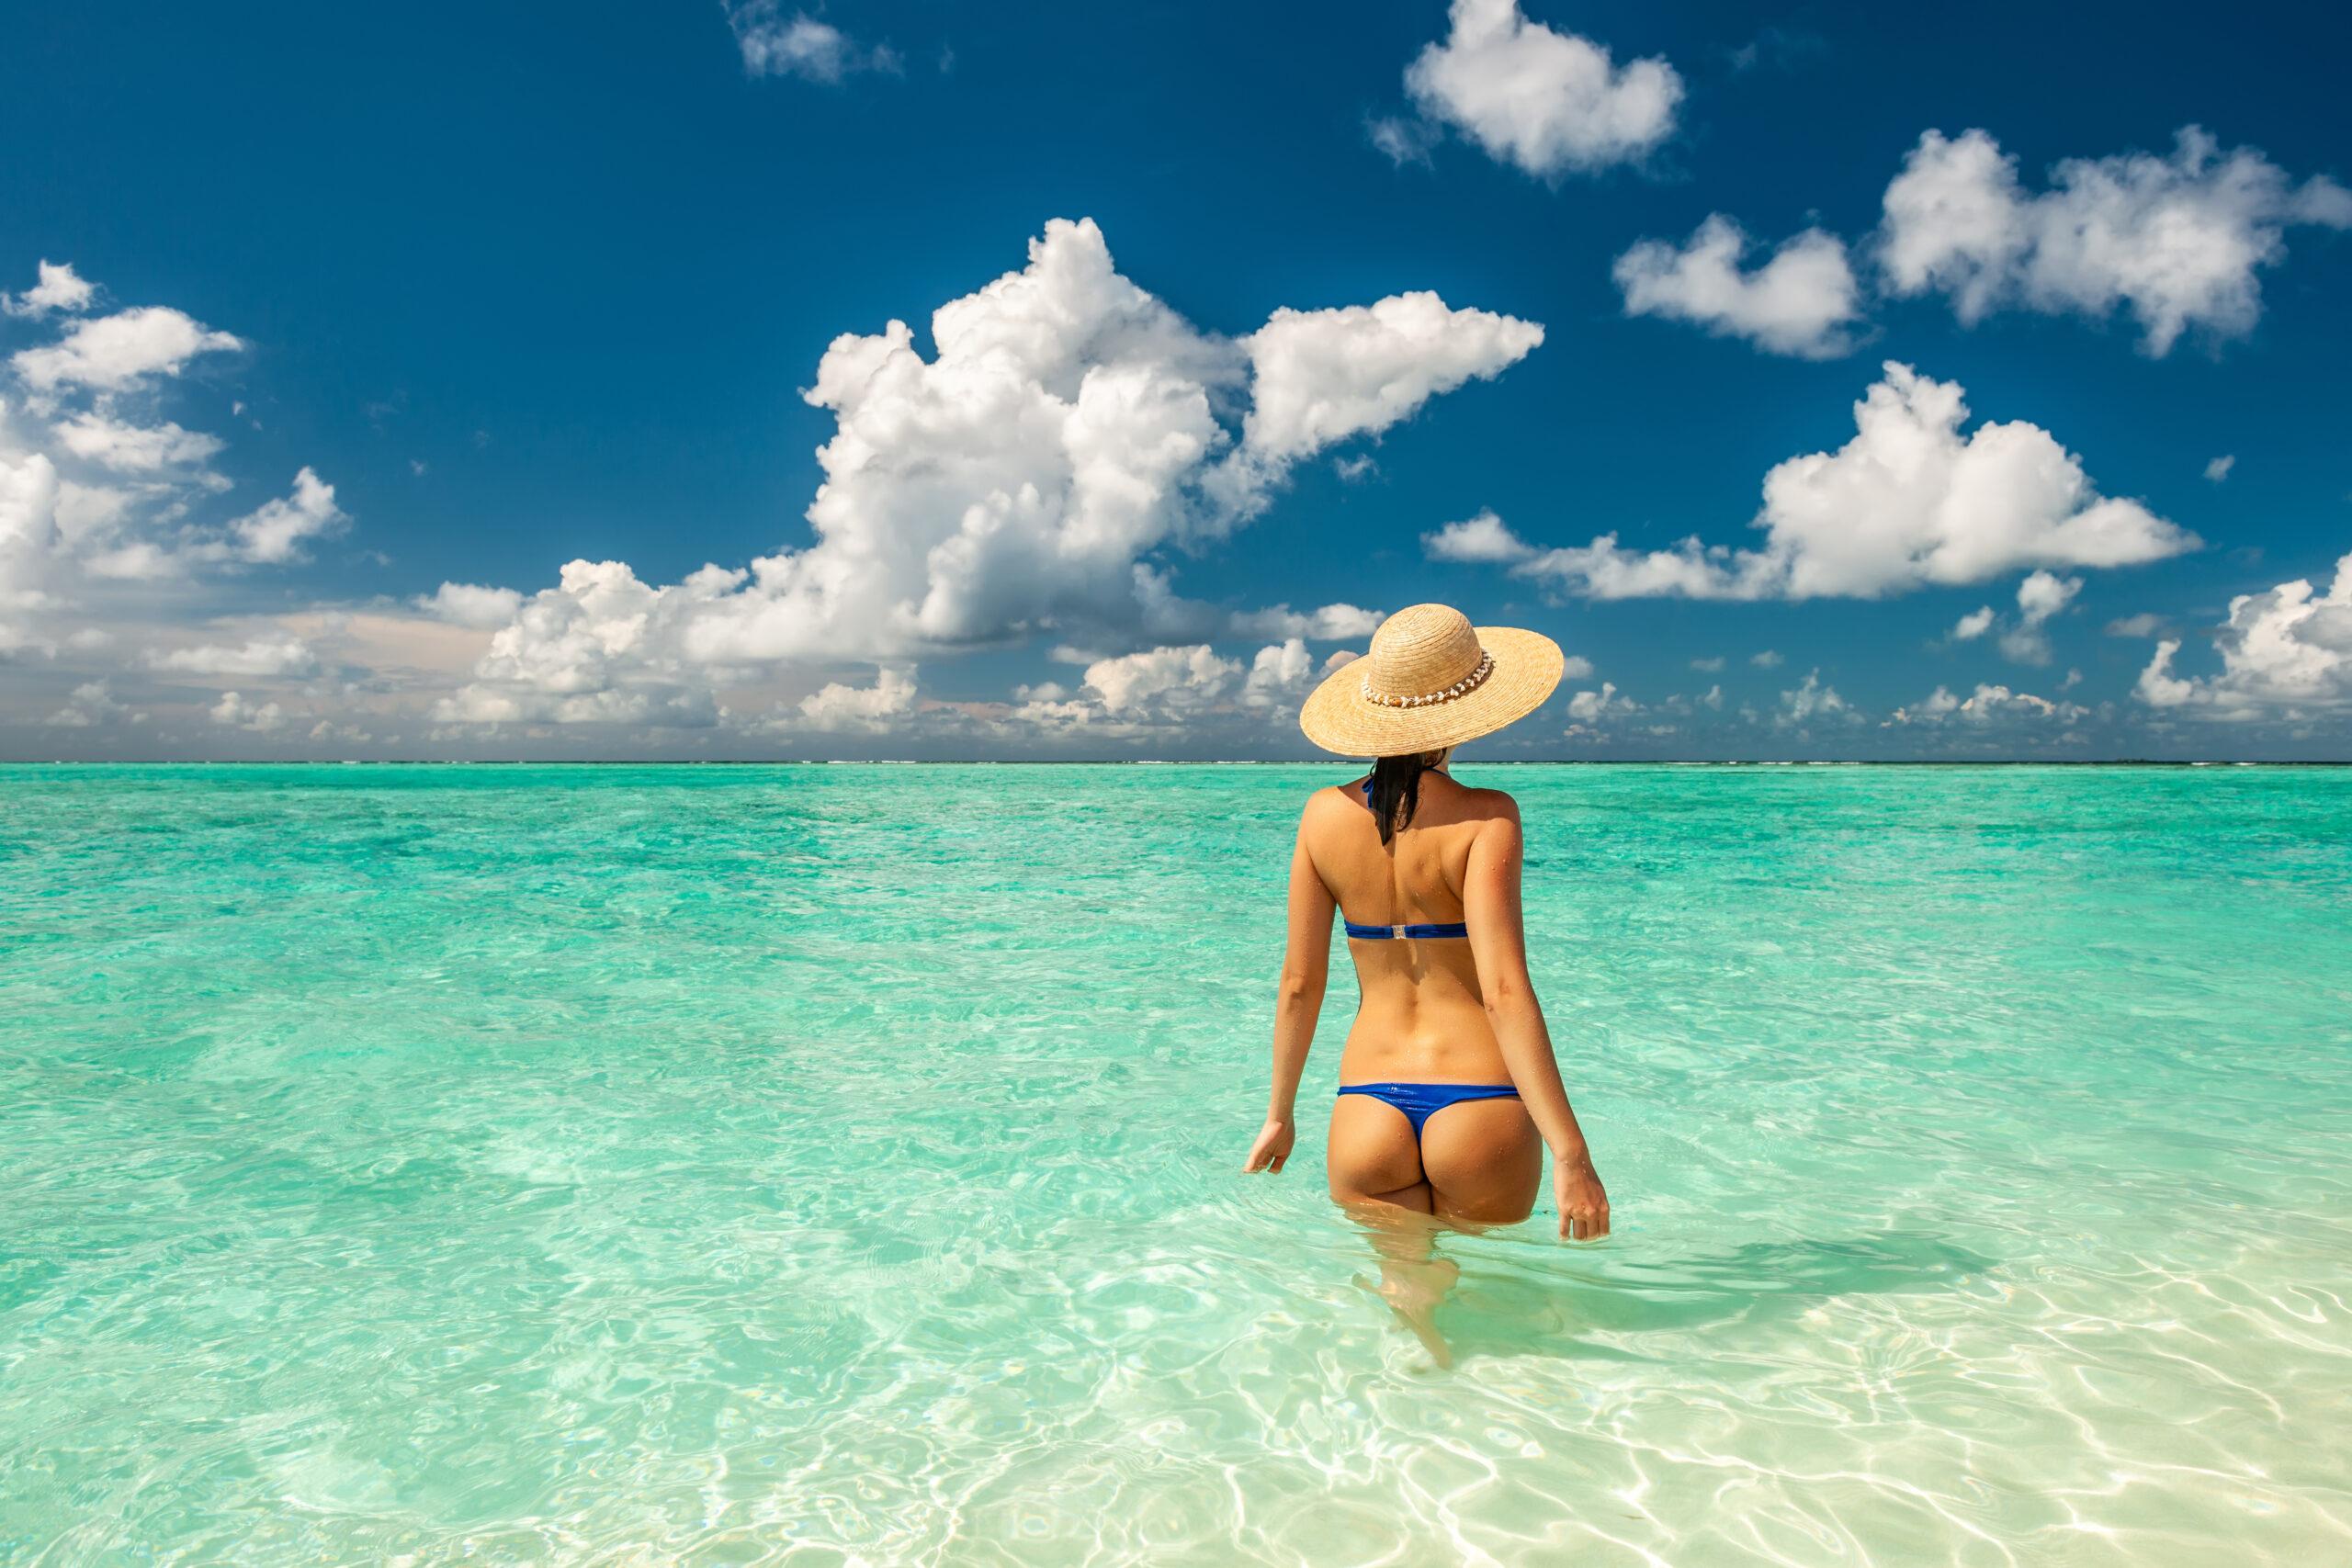 Woman in bikini at beach in maldives PB3VQY2